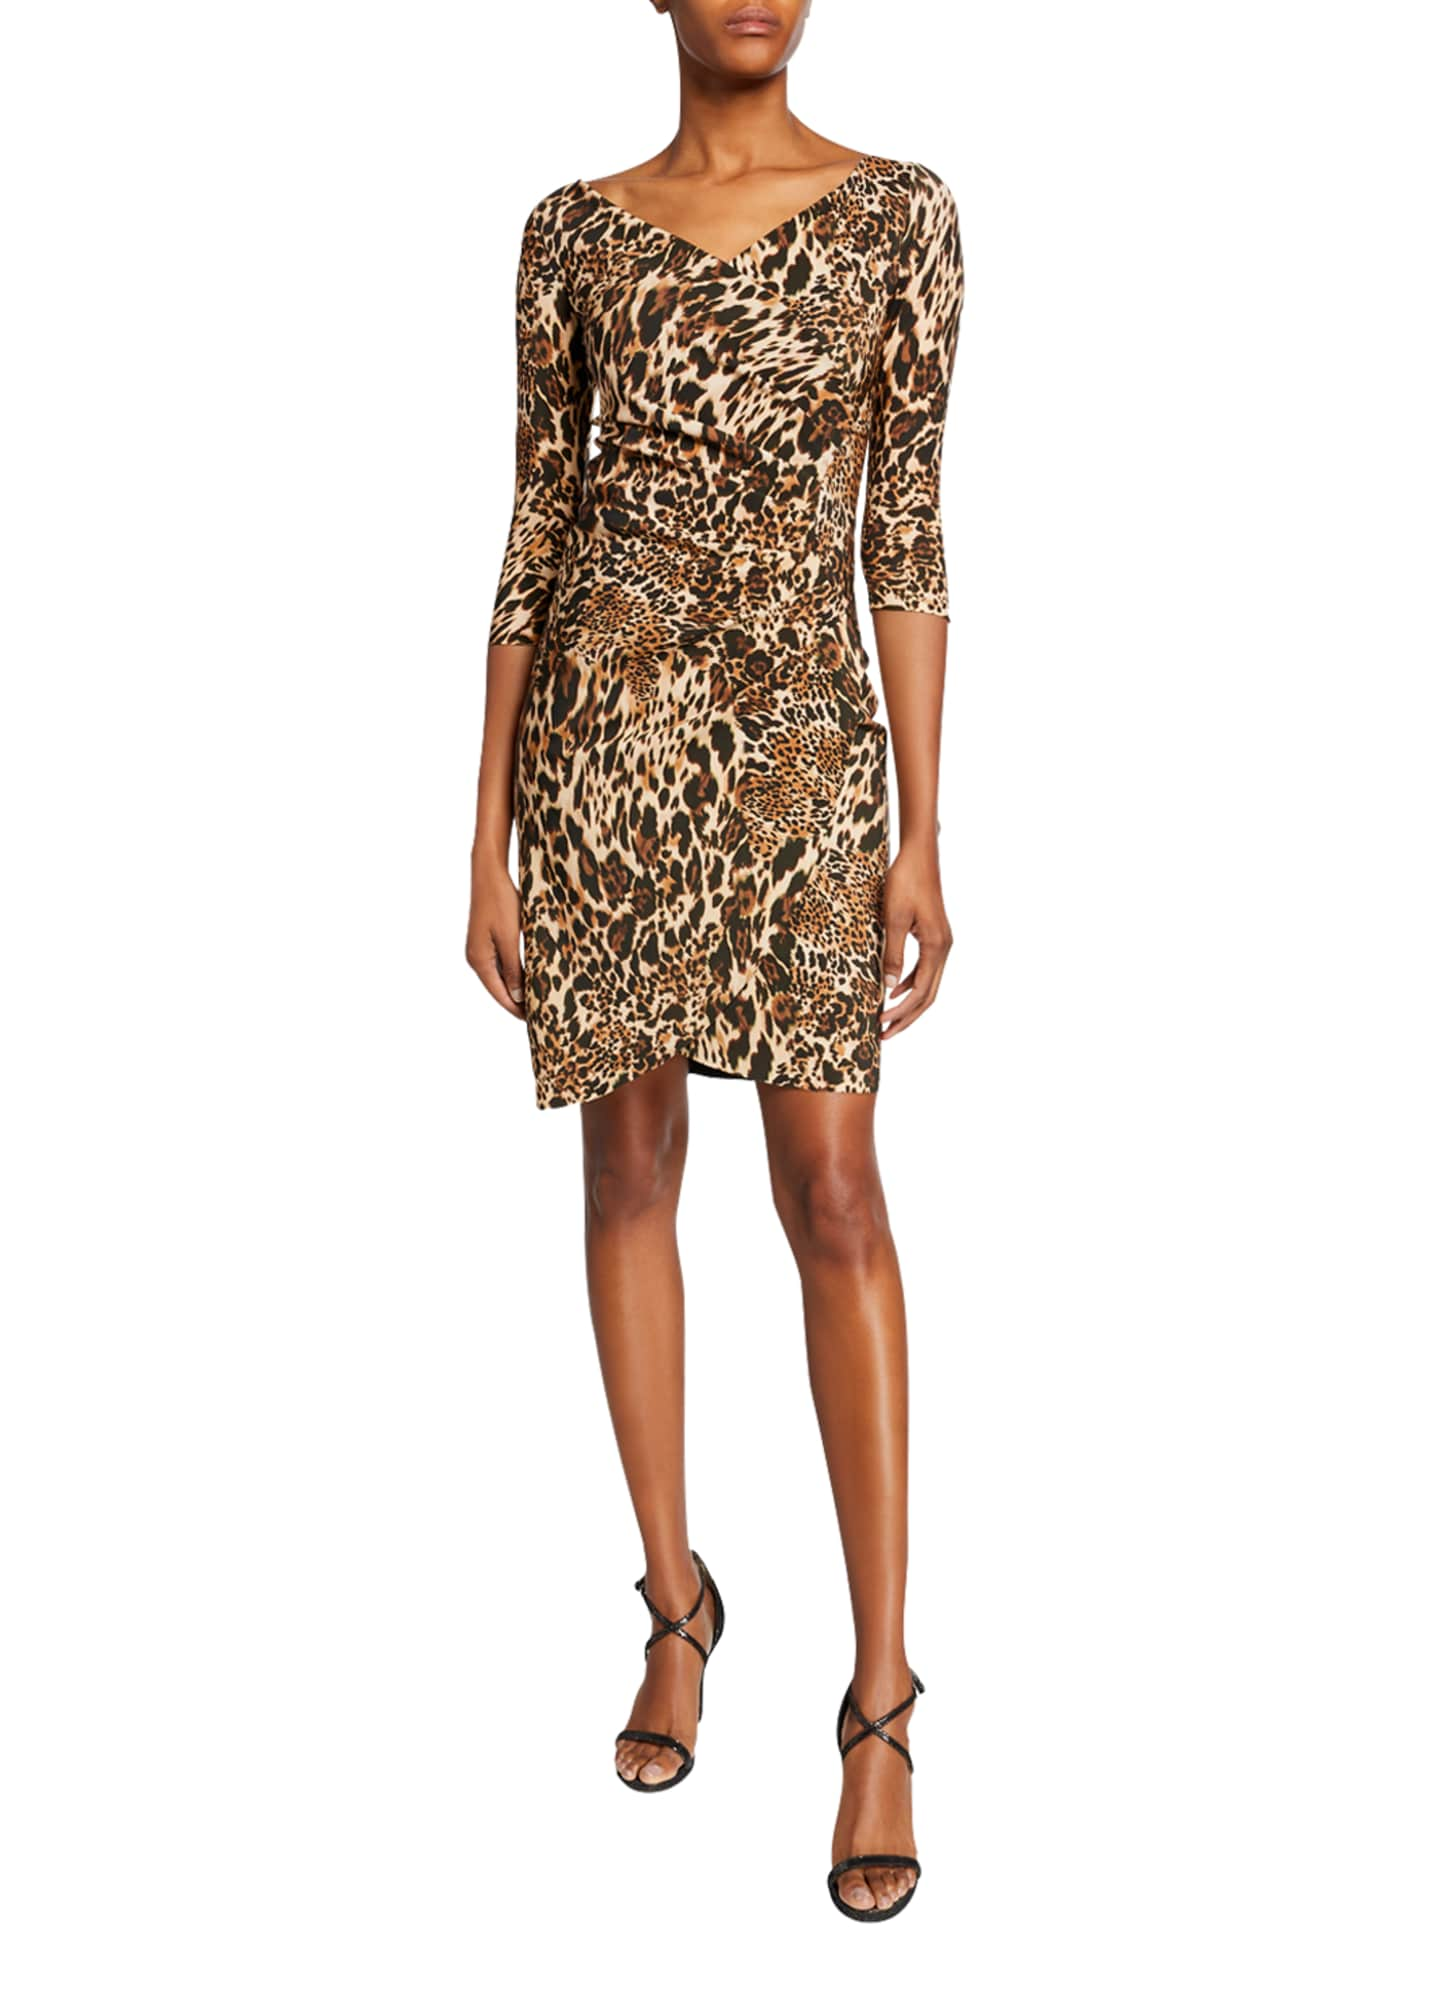 Chiara Boni La Petite Robe Emerentienne Leopard-Print 3/4-Sleeve